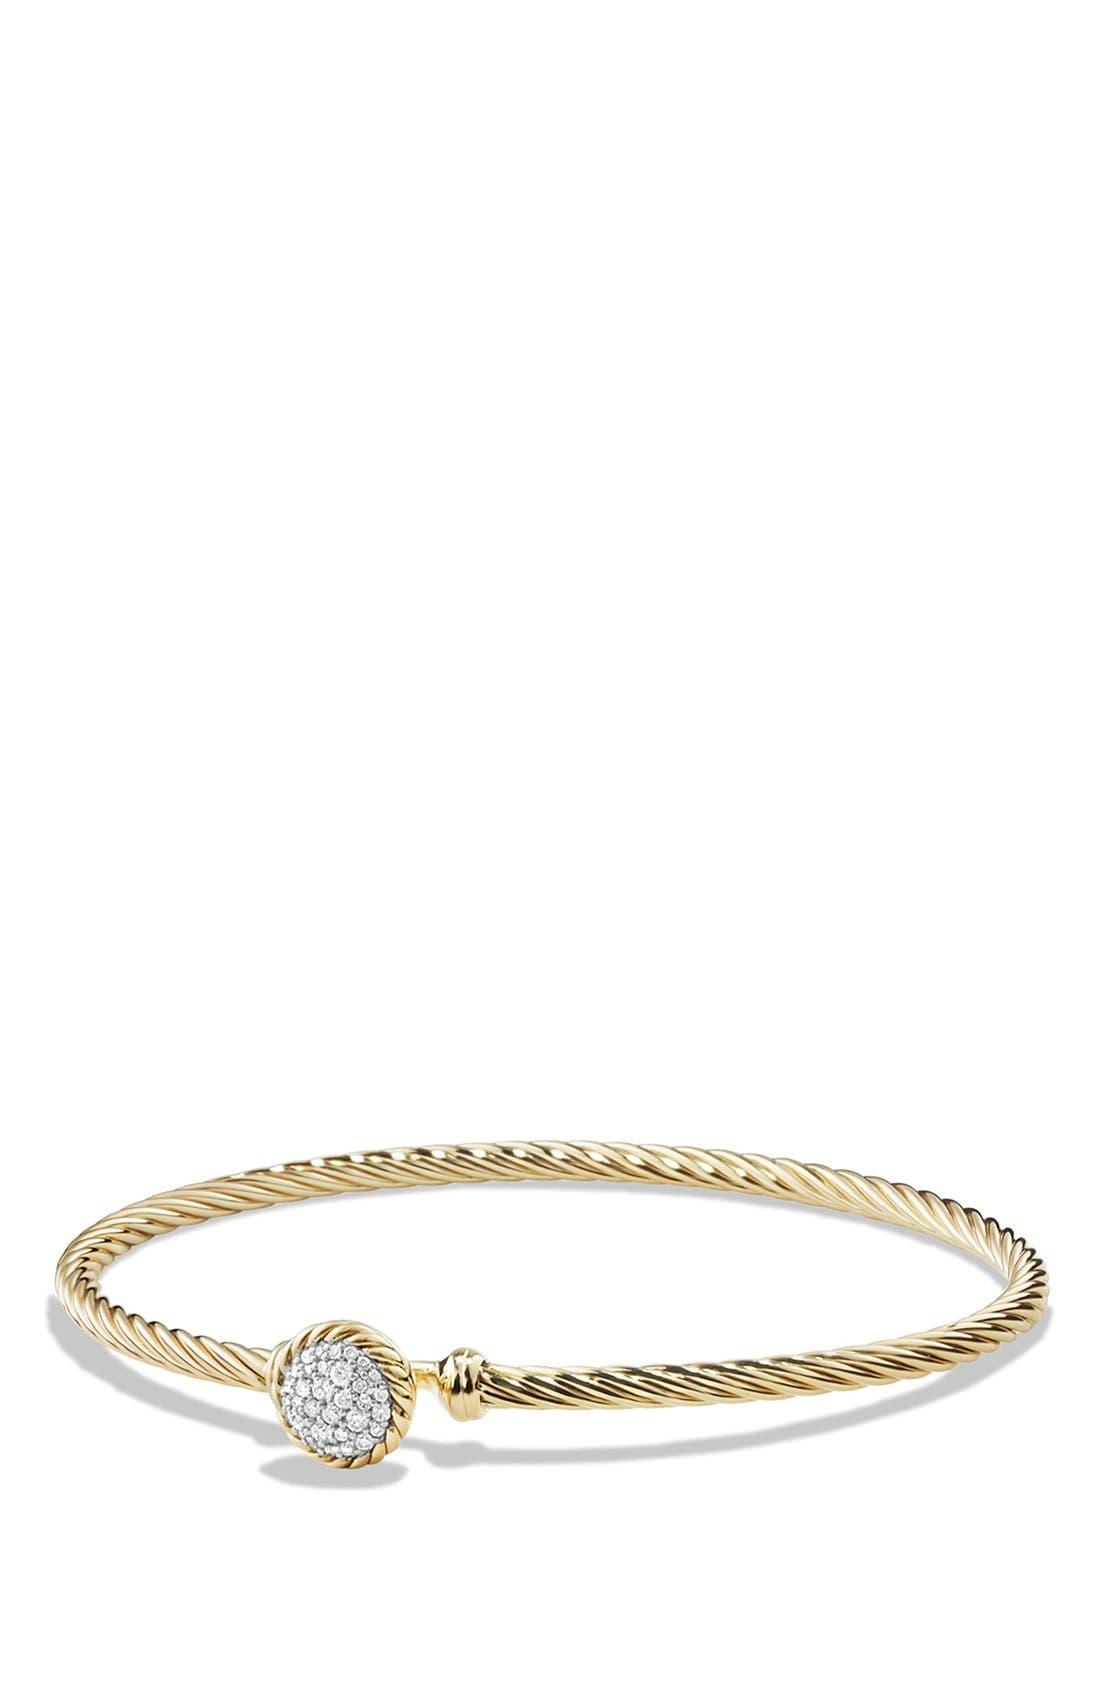 Main Image - David Yurman 'Châtelaine' Bracelet with Diamonds in 18K Gold